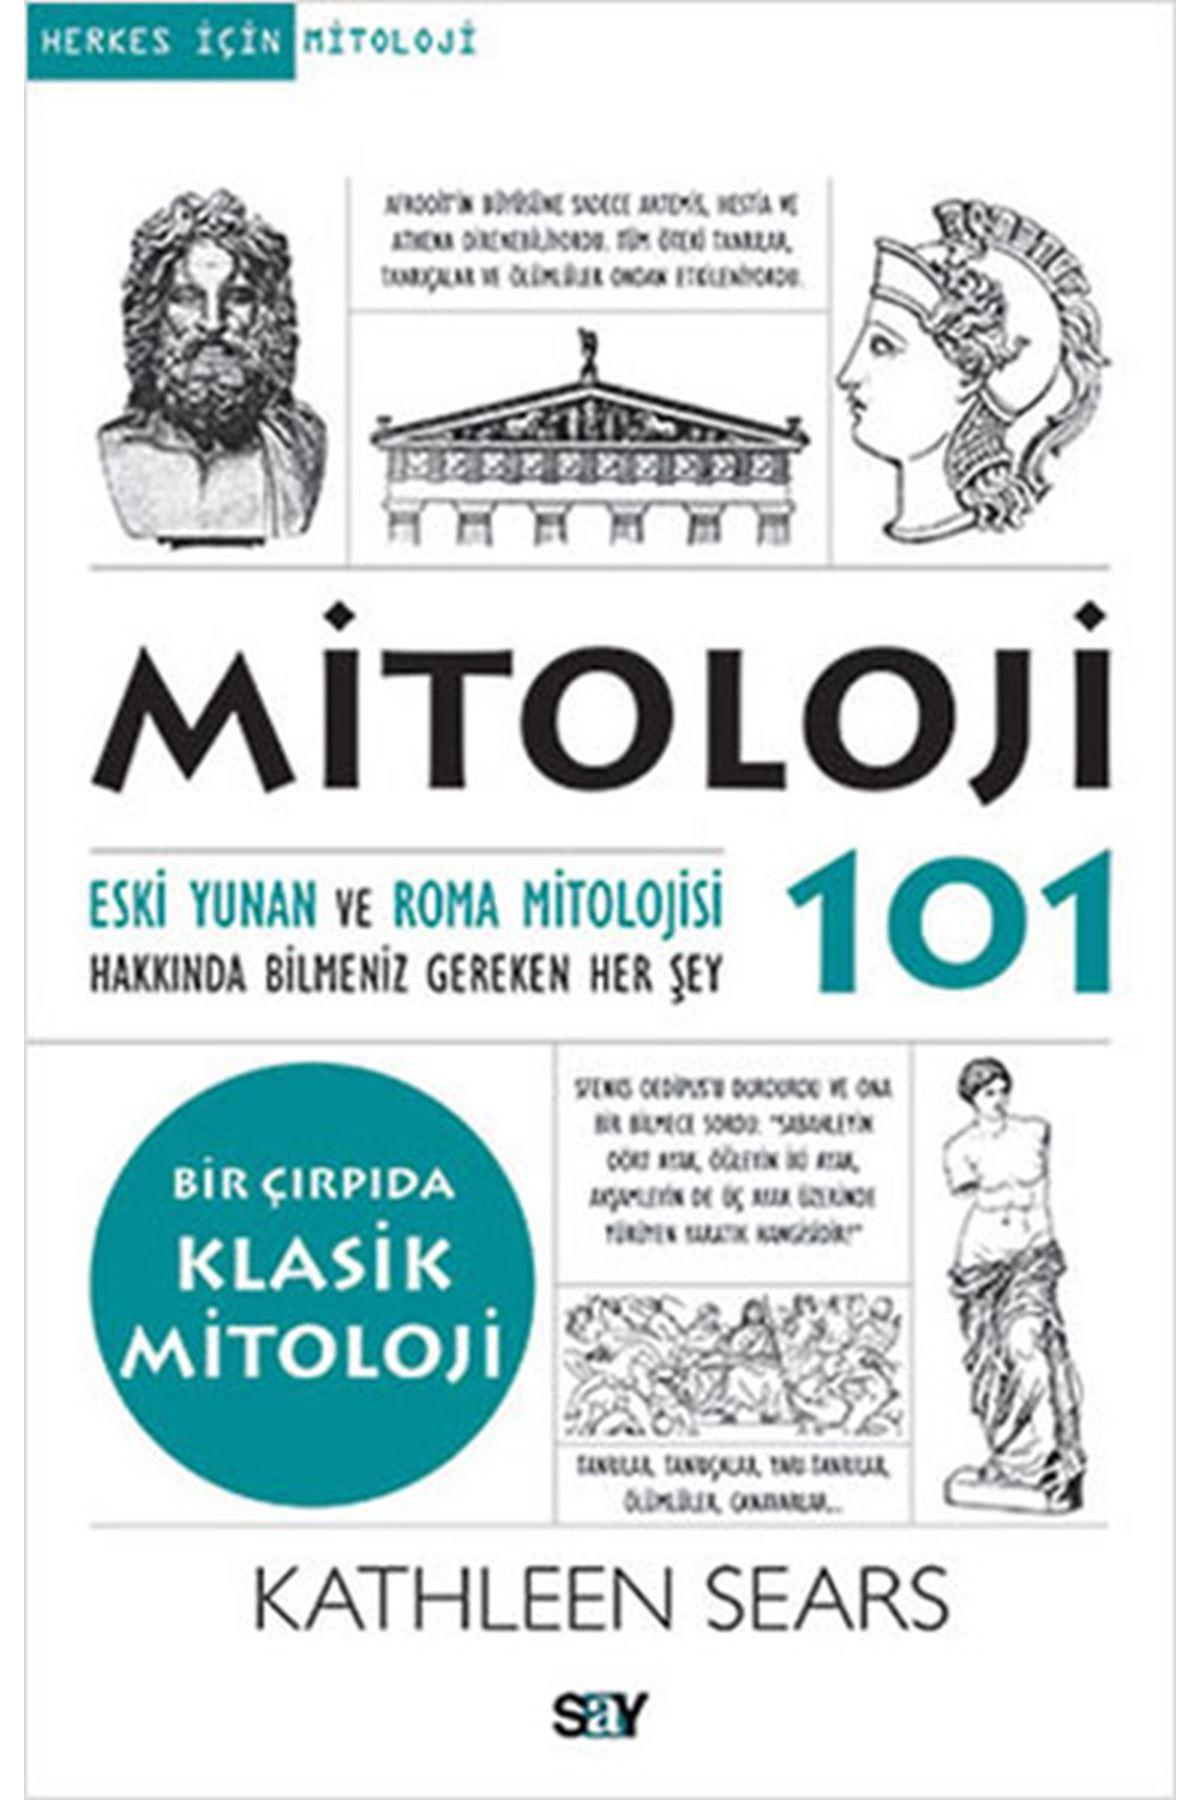 KATHLEEN SEARS - MİTOLOJİ 101 ESKİ YUNAN VE ROMA MİTOLOJİSİ